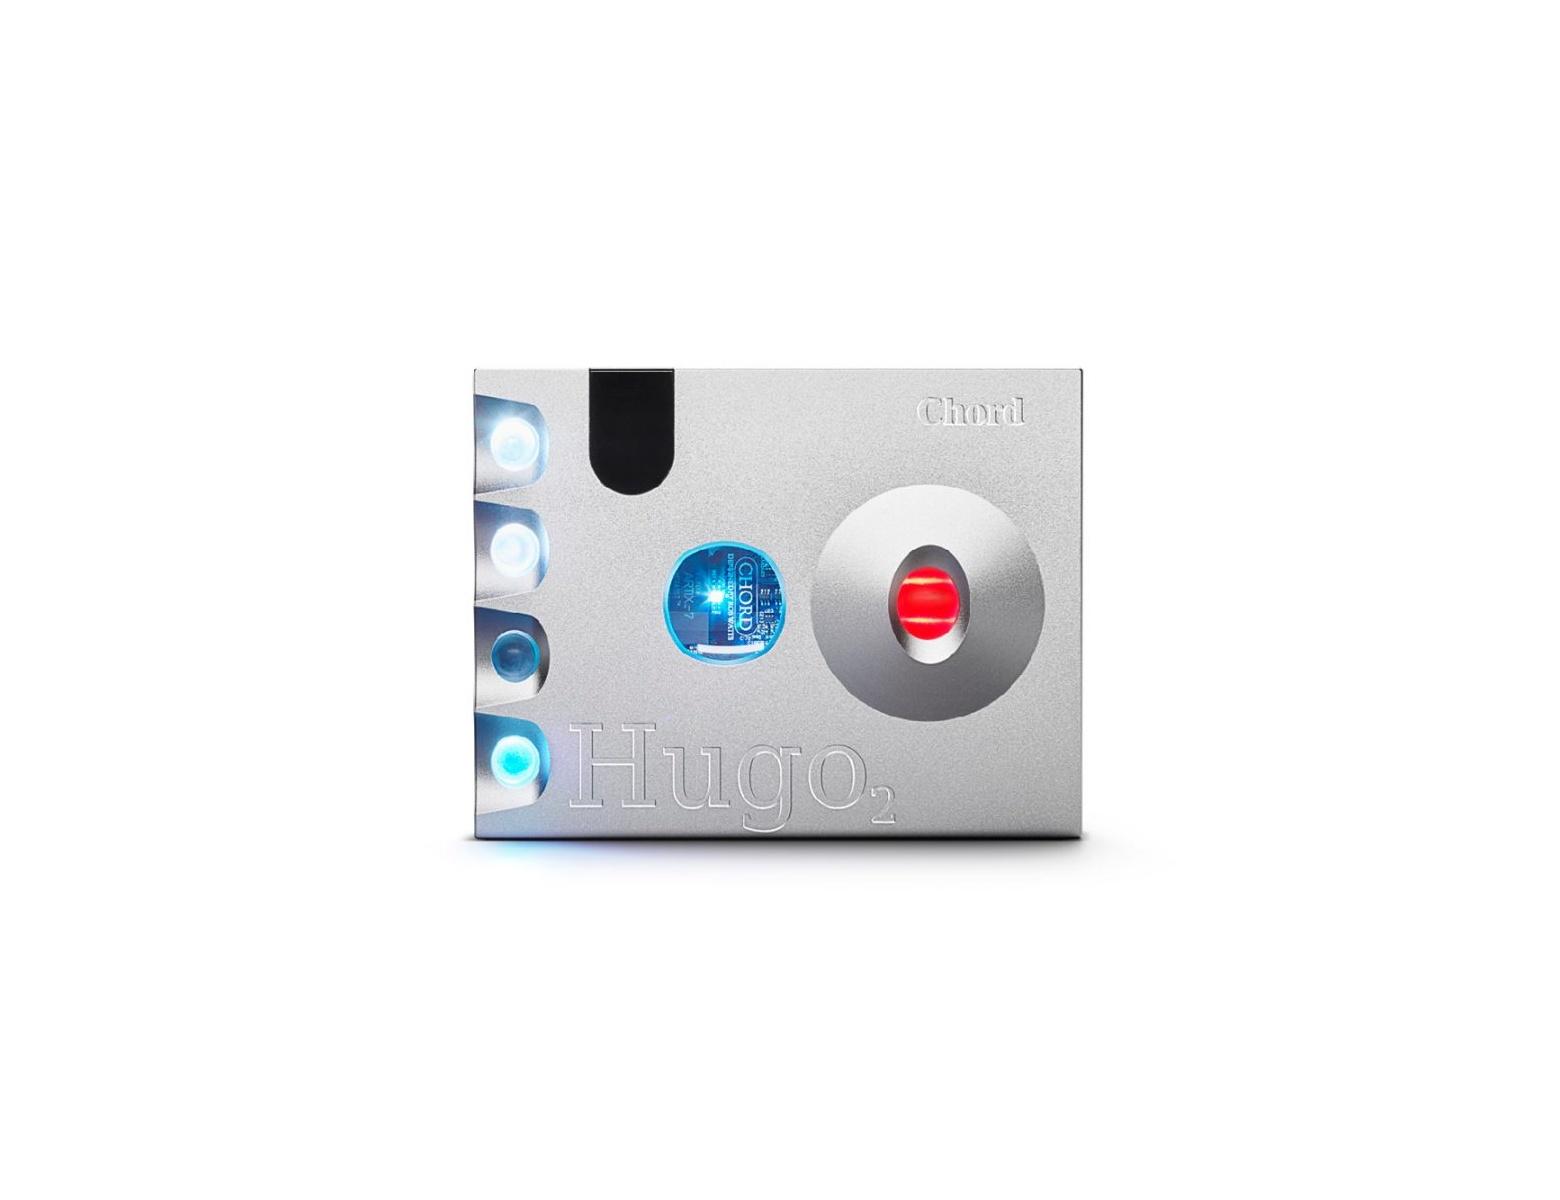 Chord Hugo2 Portable DAC & Headphone Amplifier